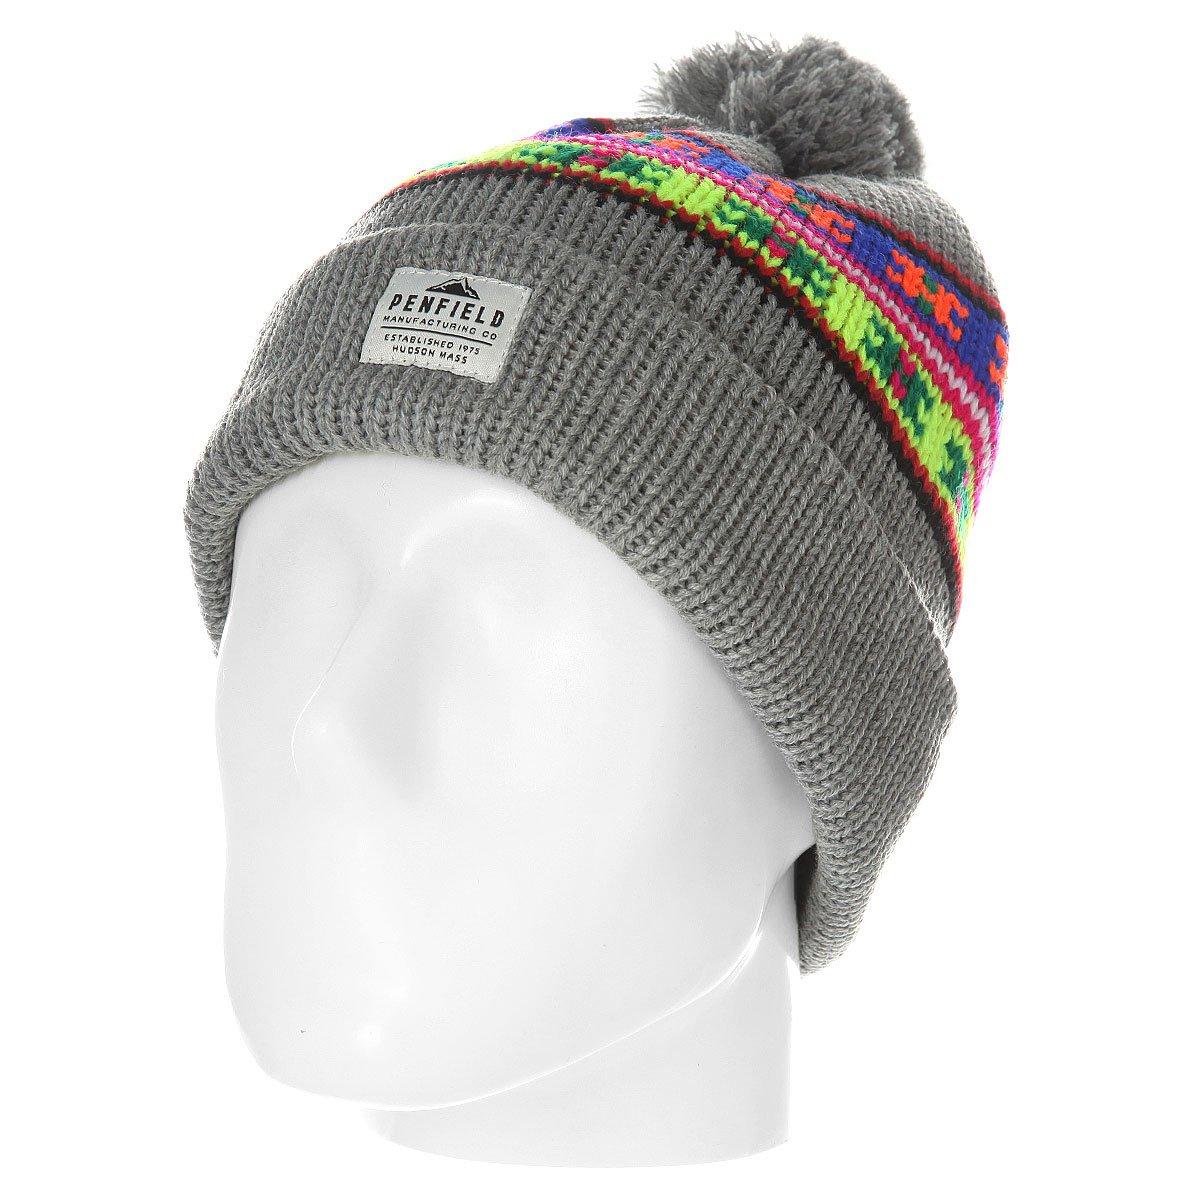 51f910ccb7f Купить шапку Penfield Acc Himal Neon Pattern Bobble Beanie Grey в ...